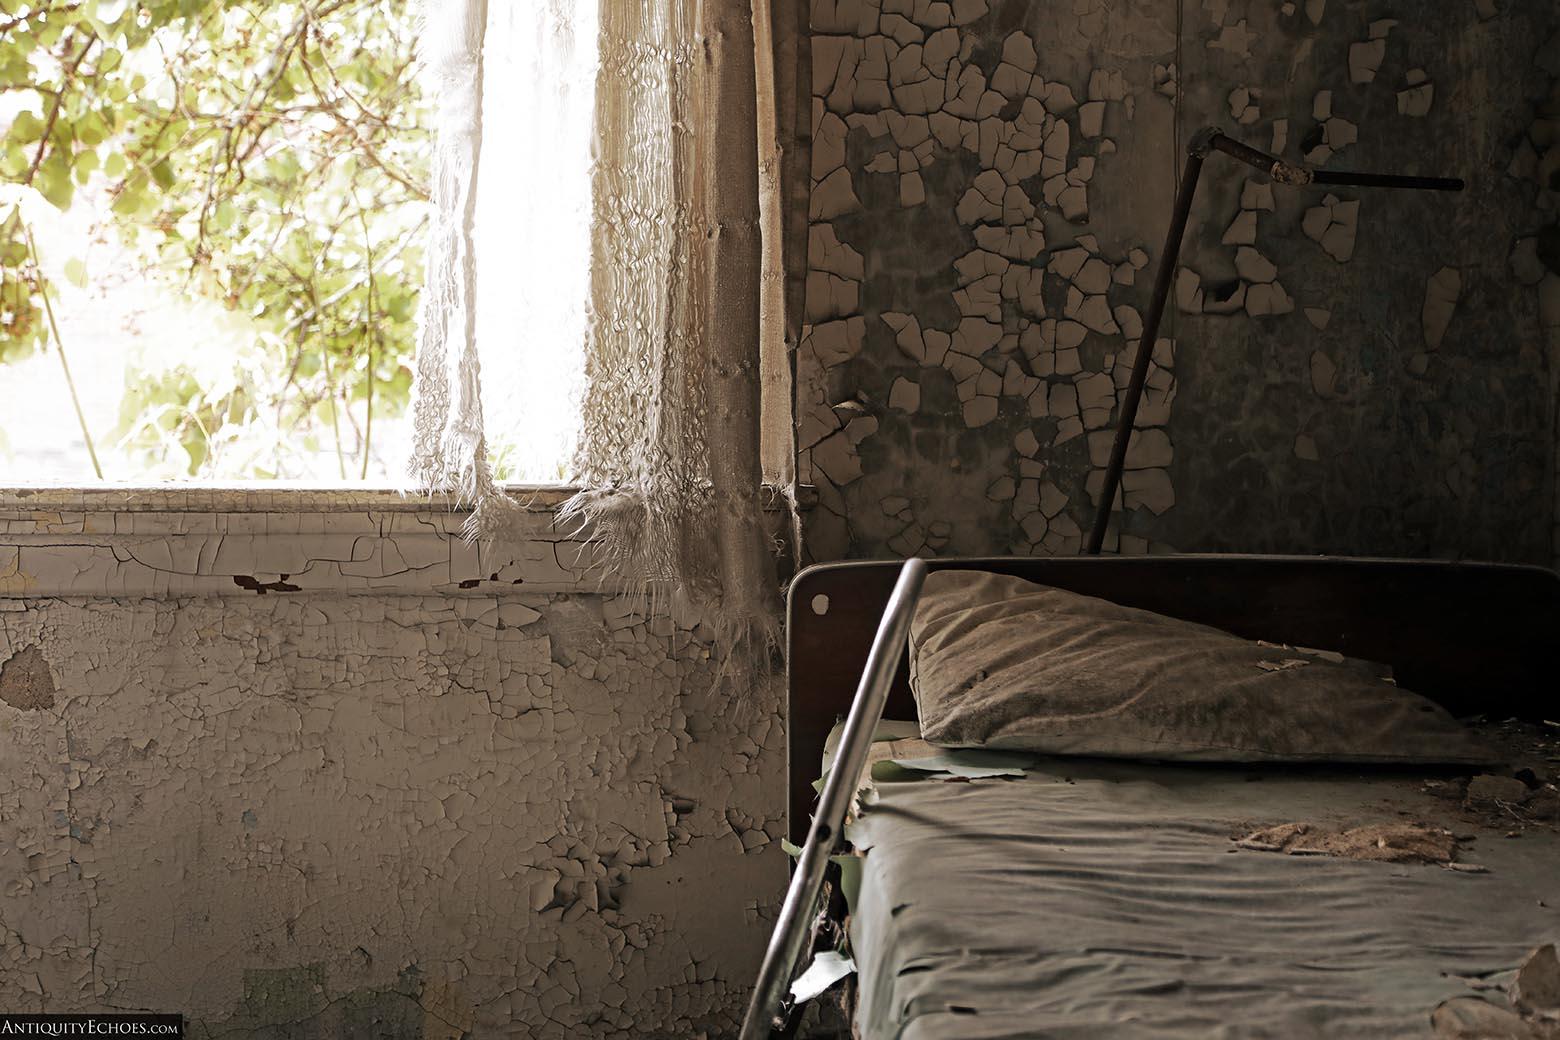 Brownsville General Hospital - Peeling Paint in a Patient Bedroom